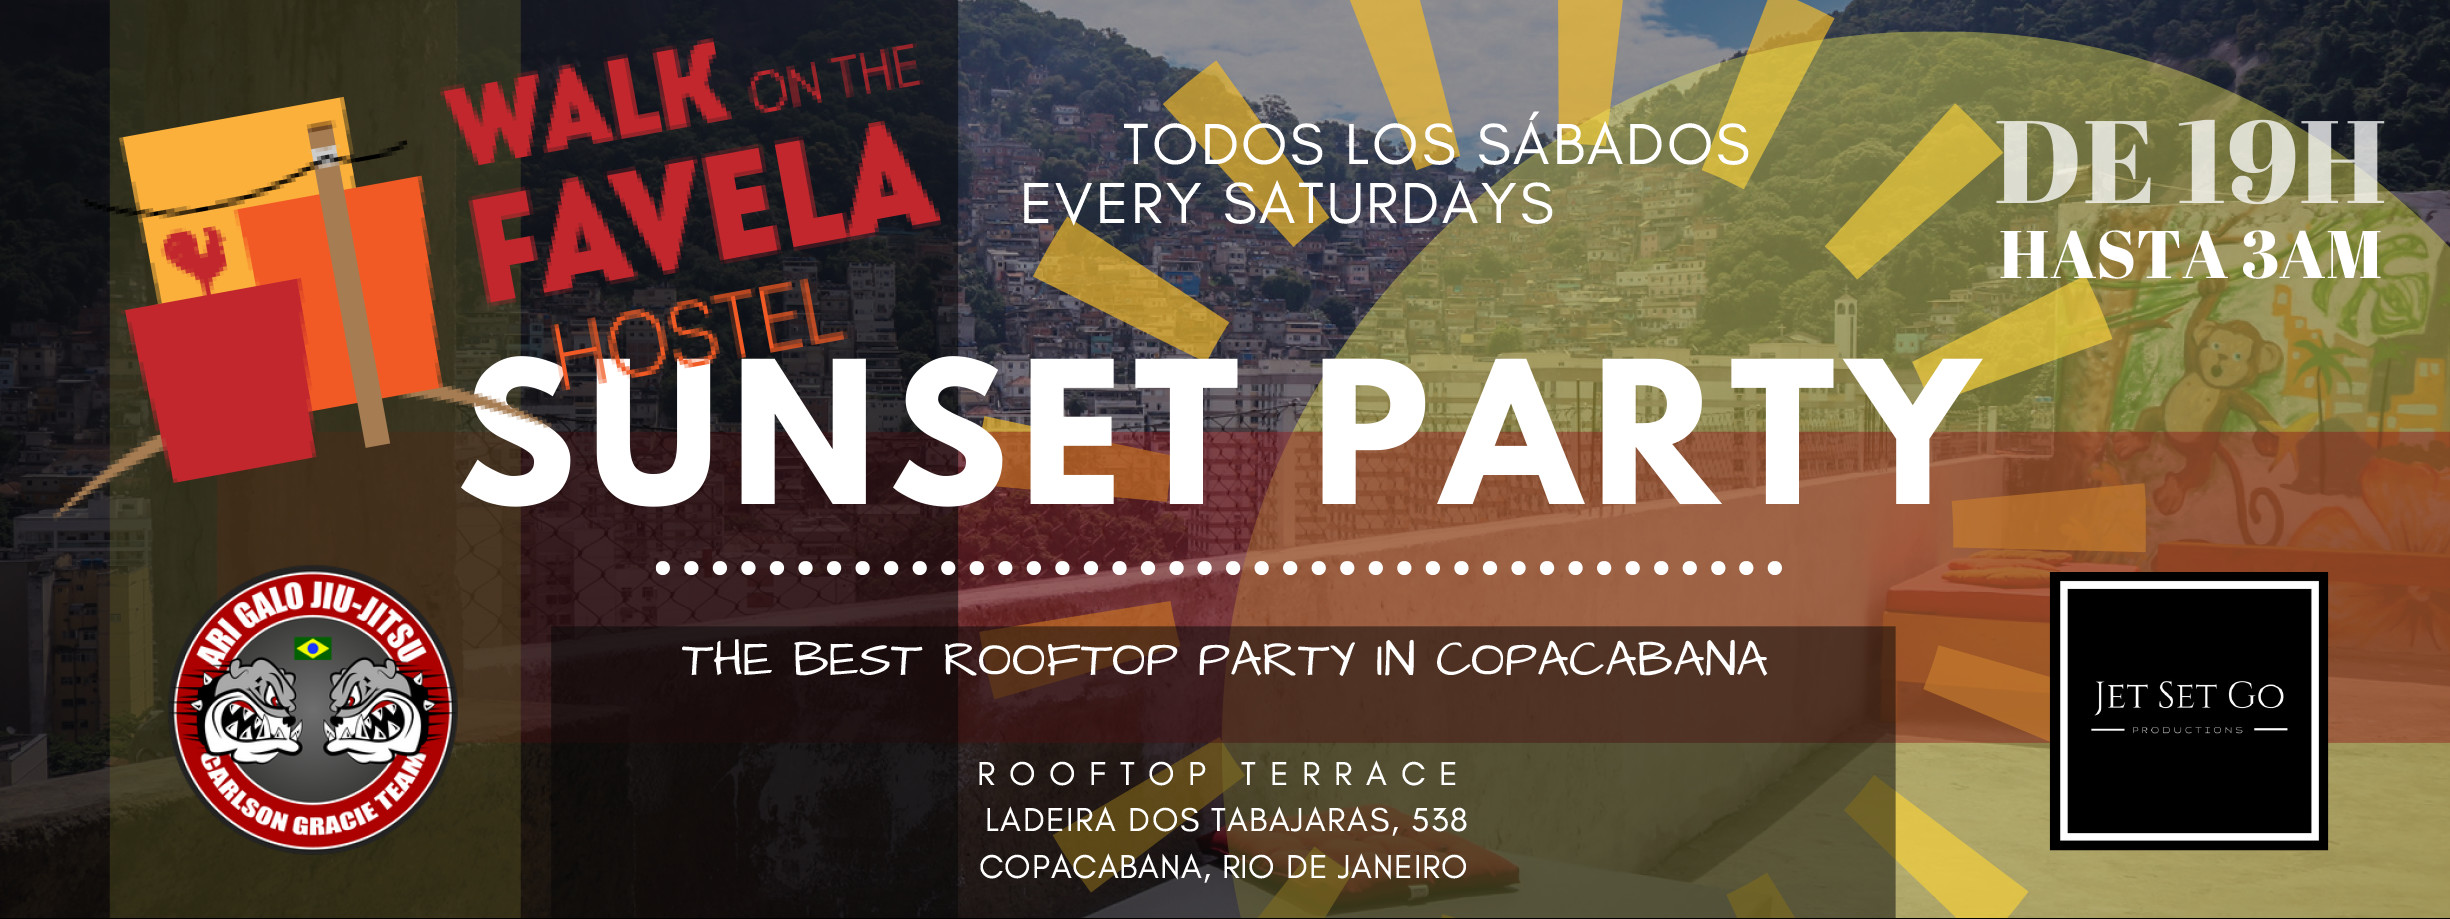 Hostel-SaturdayFestas2